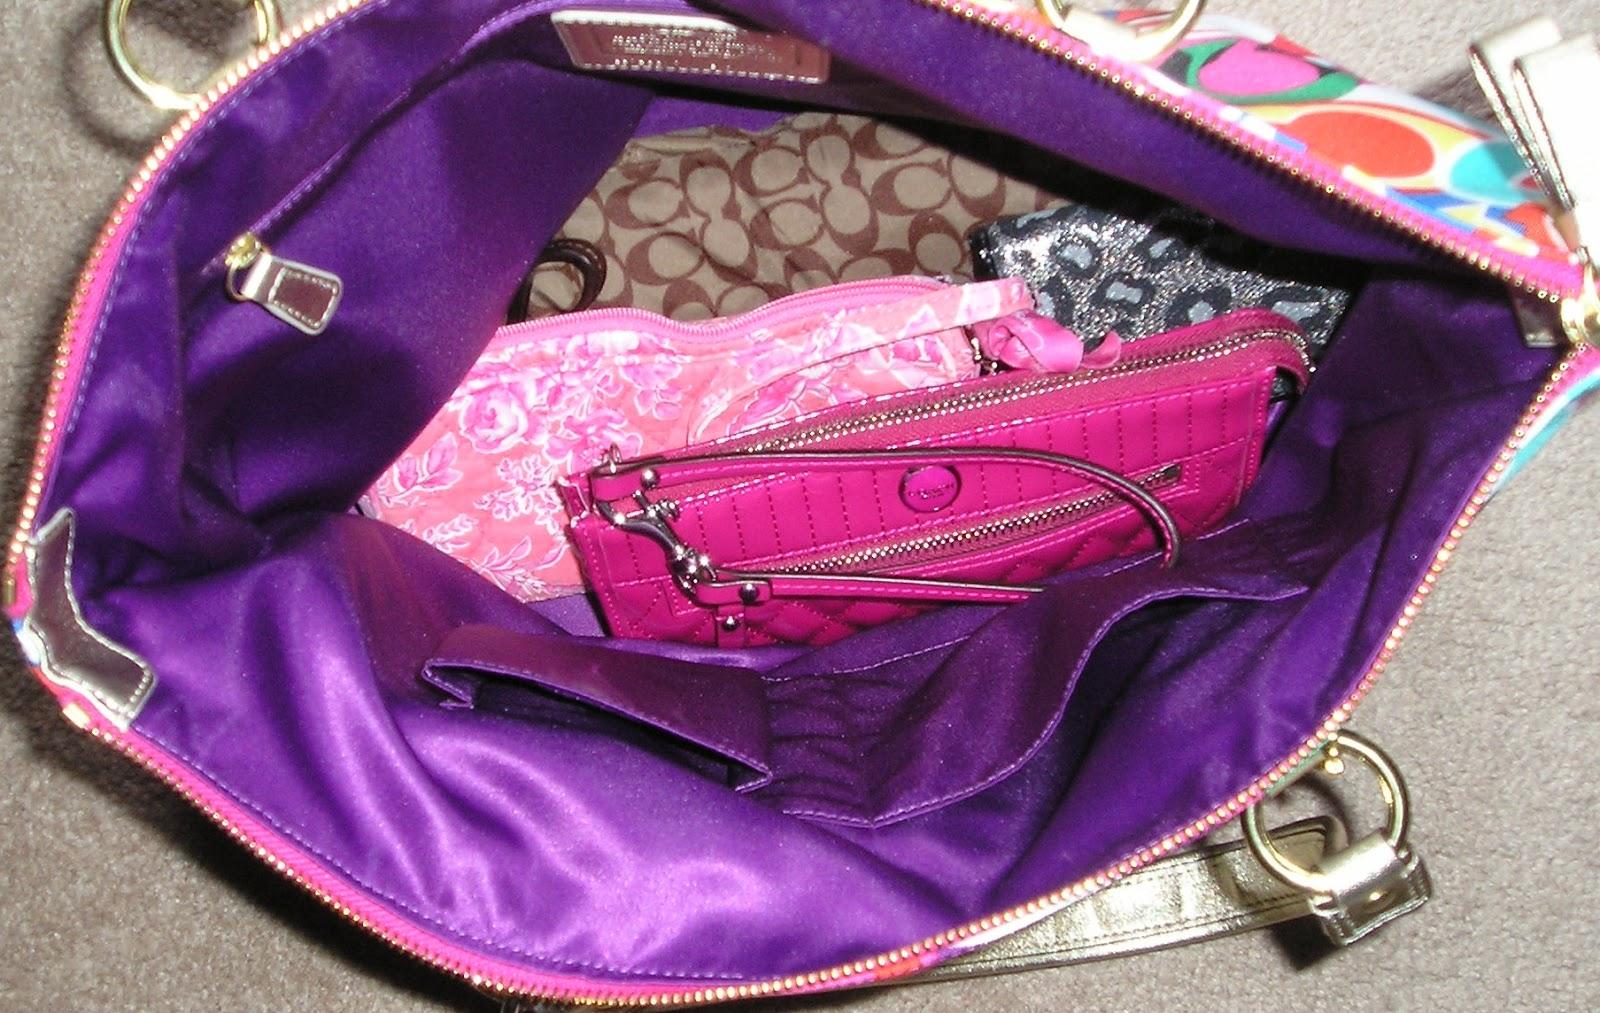 Items In My Bag 1 Liquid Gloss Zip Clutch Has Keys It So Don T Tear Up The Silk Lining 2 Signature Print Umbrella 3 Vera Bradley